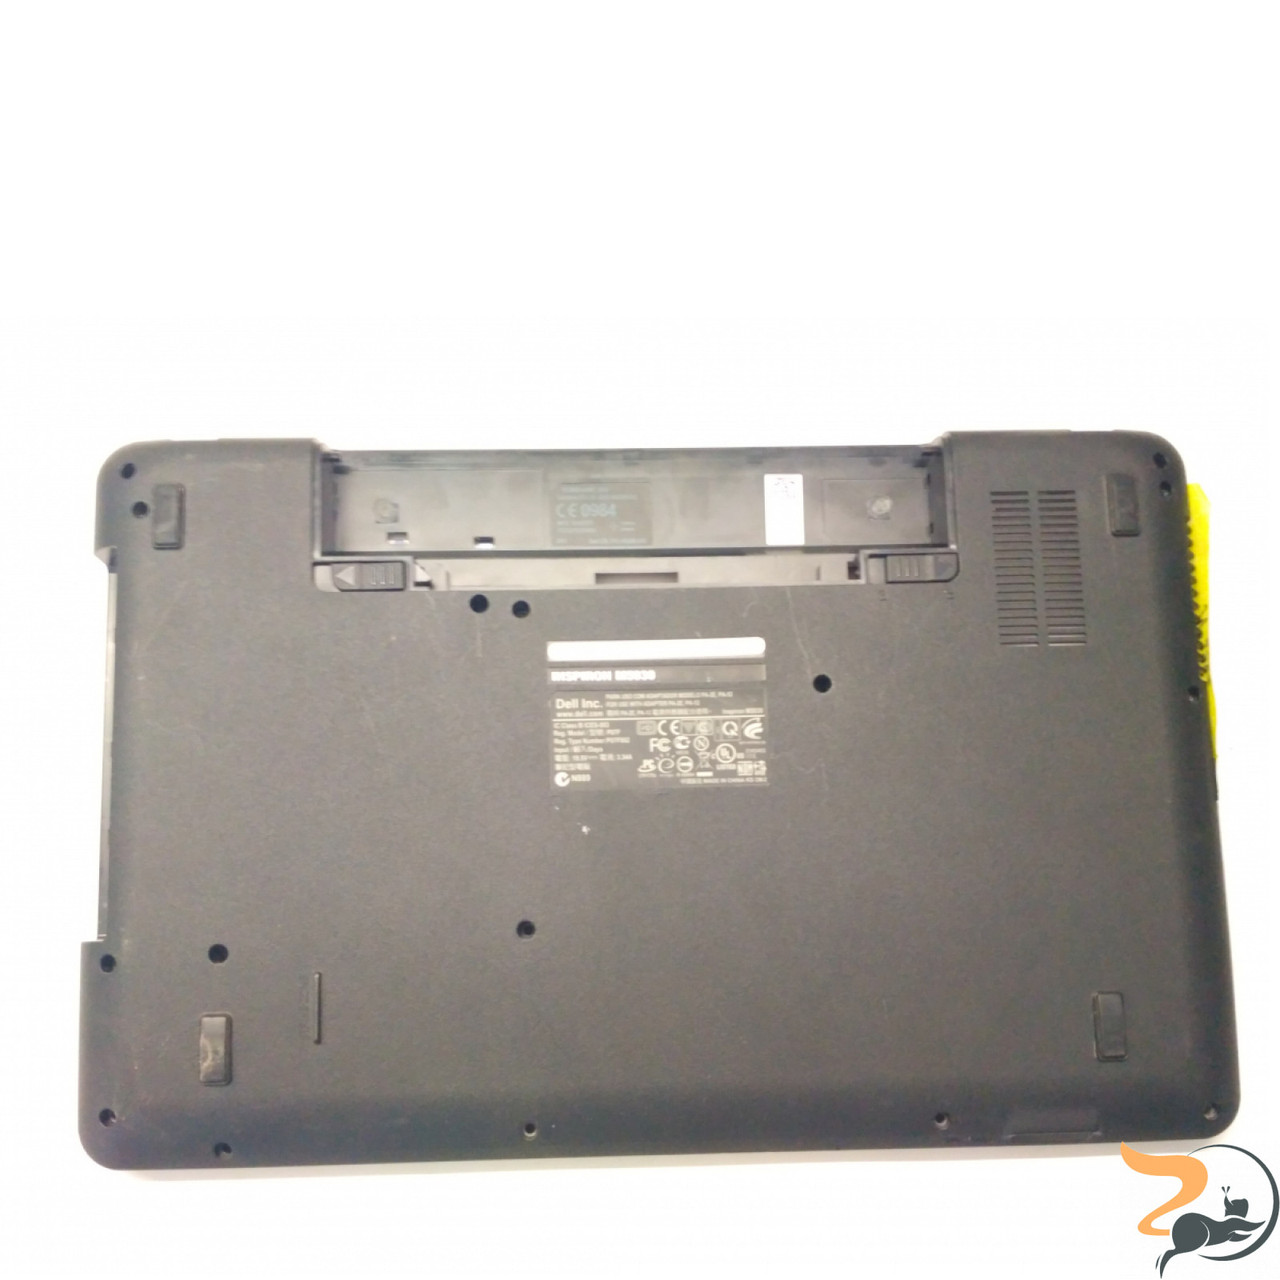 "Нижня частина корпусу для ноутбука Dell Inspiron M5030, 15.6"", 60.4EM24.002, Б/В"